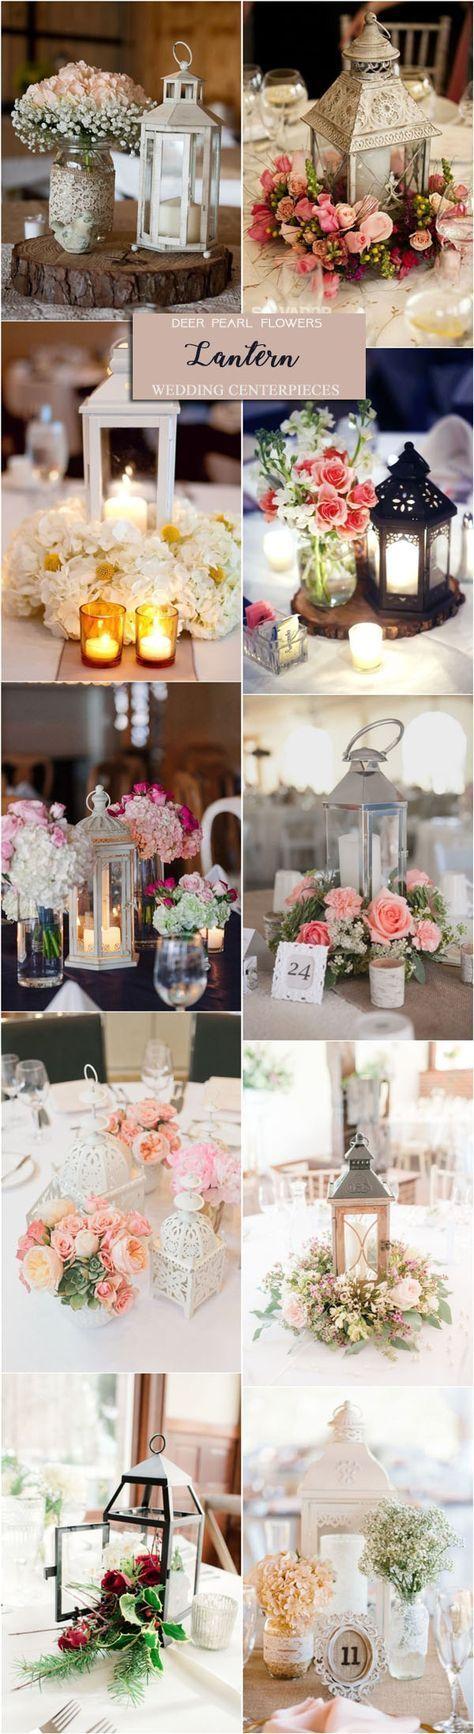 60 Insanely Wedding Centerpiece Ideas Youll Love Lantern Wedding